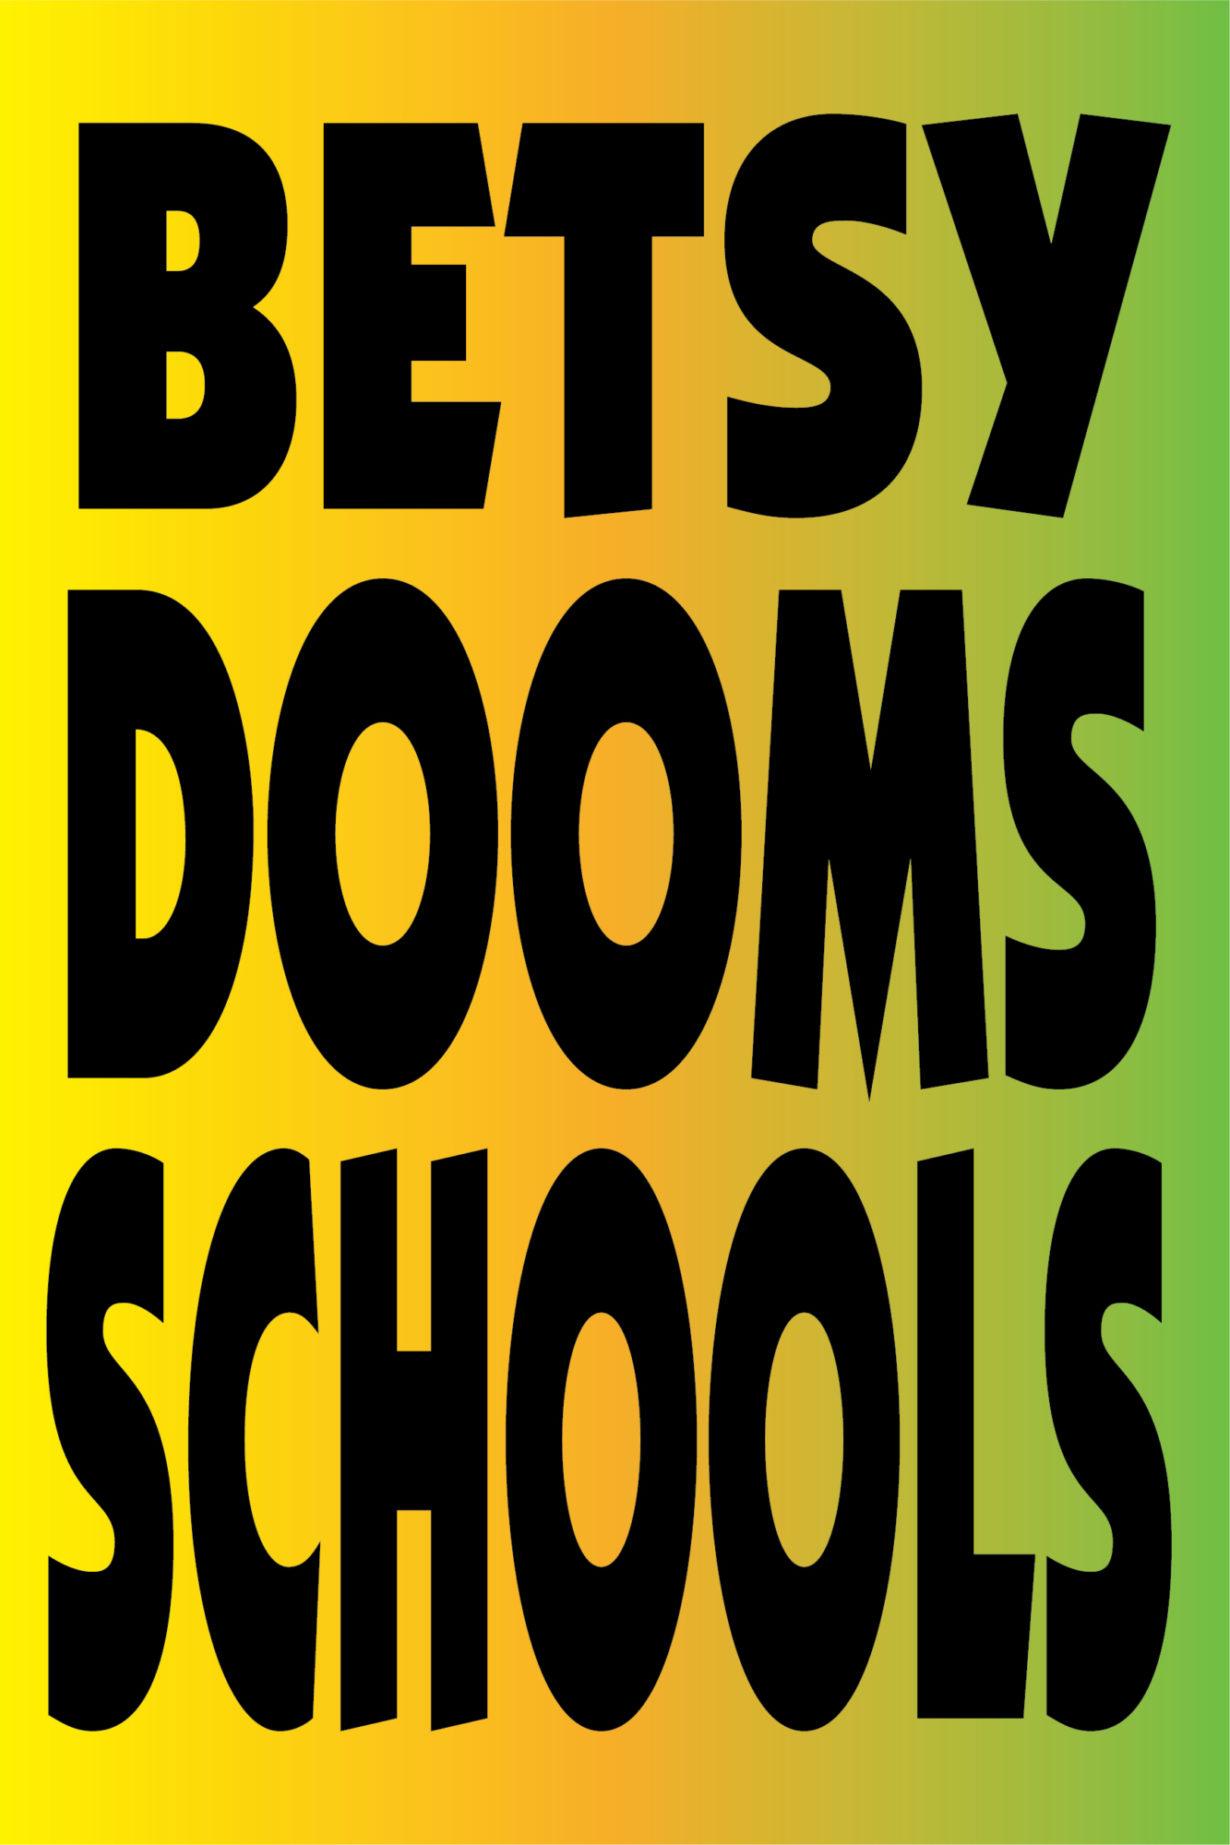 NP_51_75_2017_Betsy-Dooms-Schools.jpg